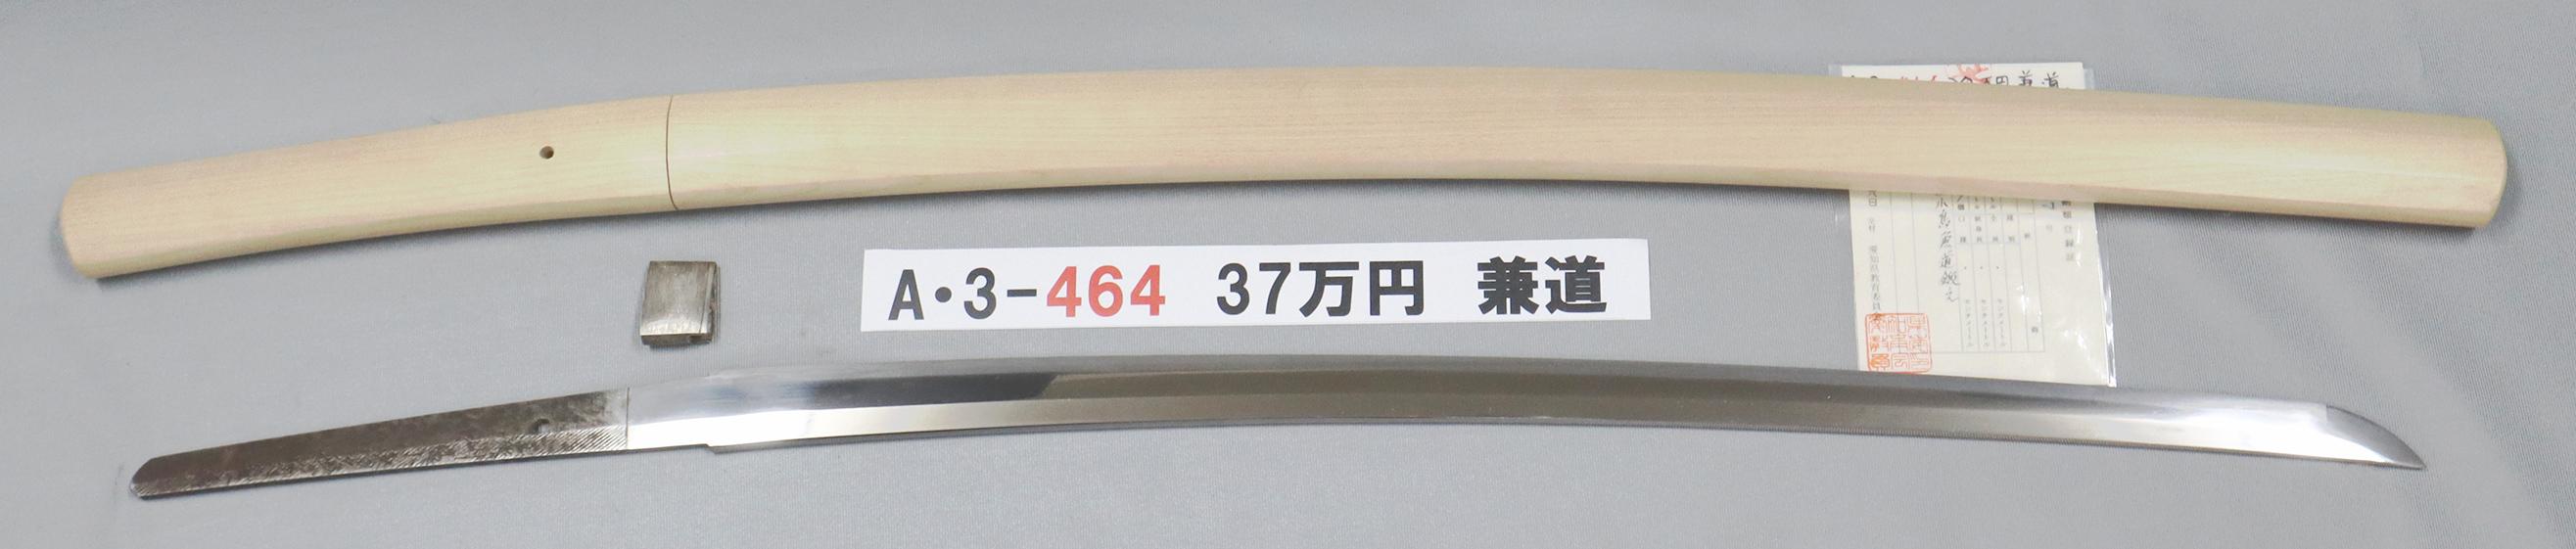 A3464